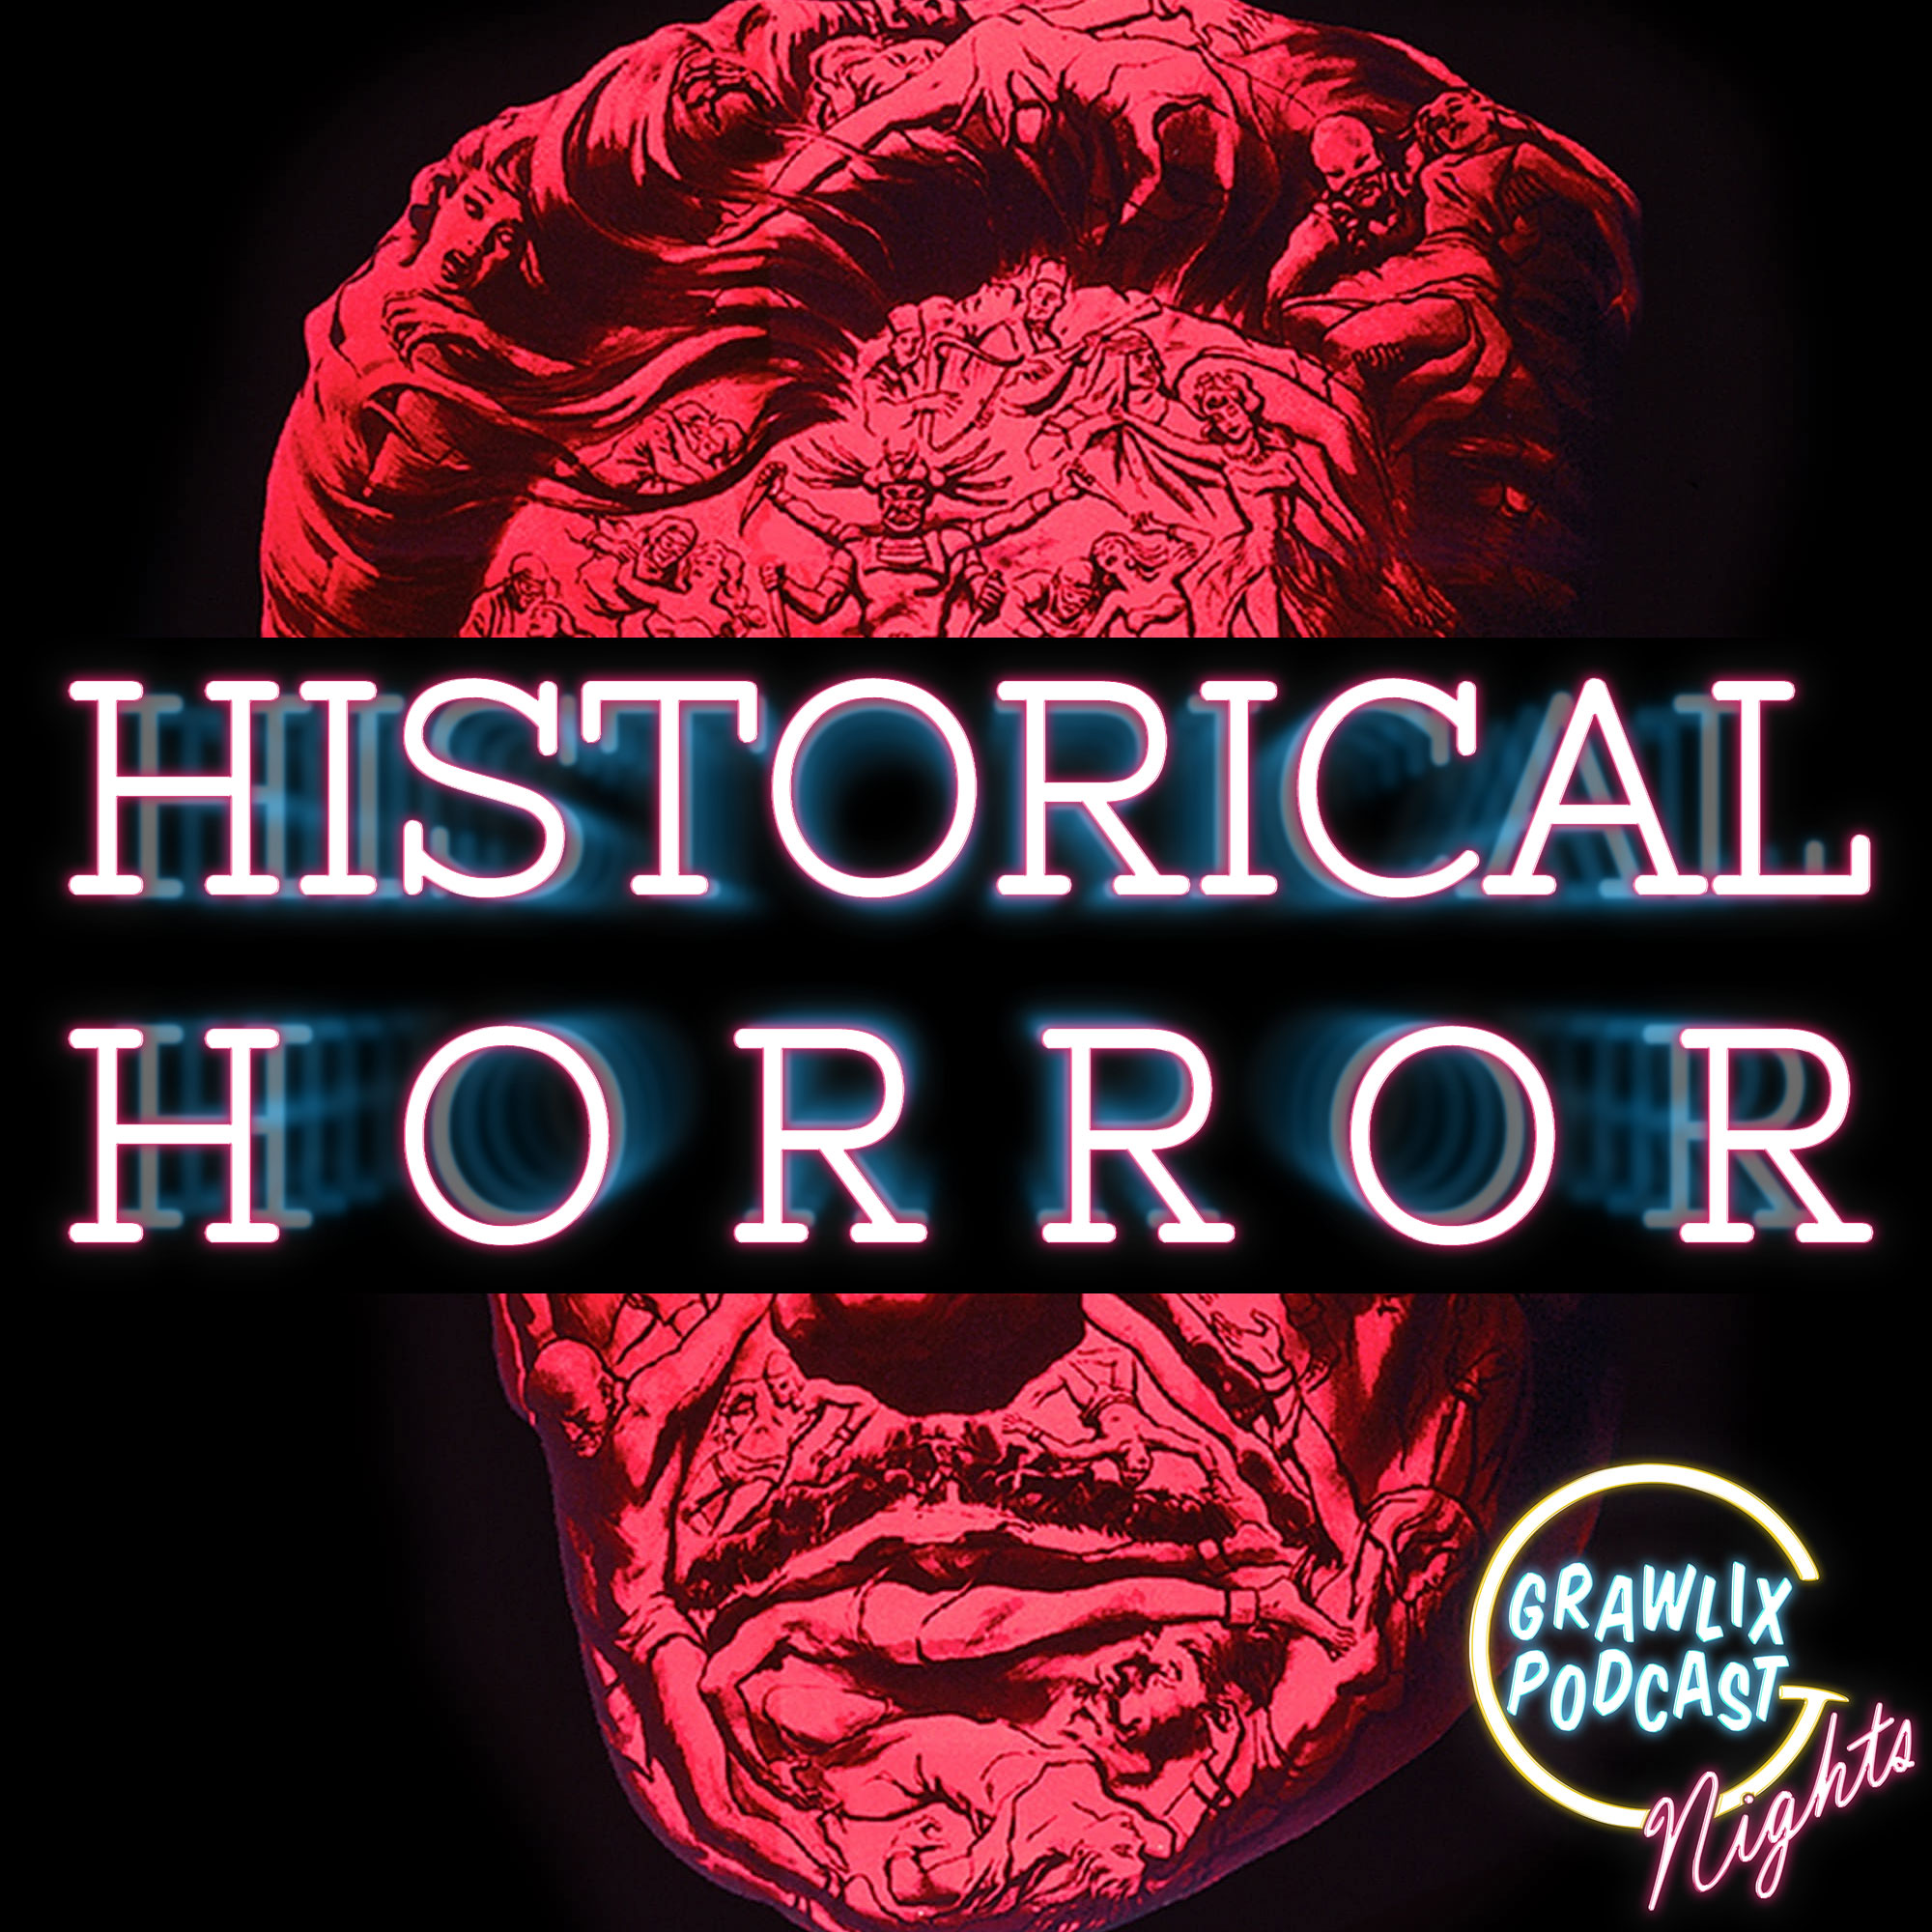 HistHORRORical - Nights